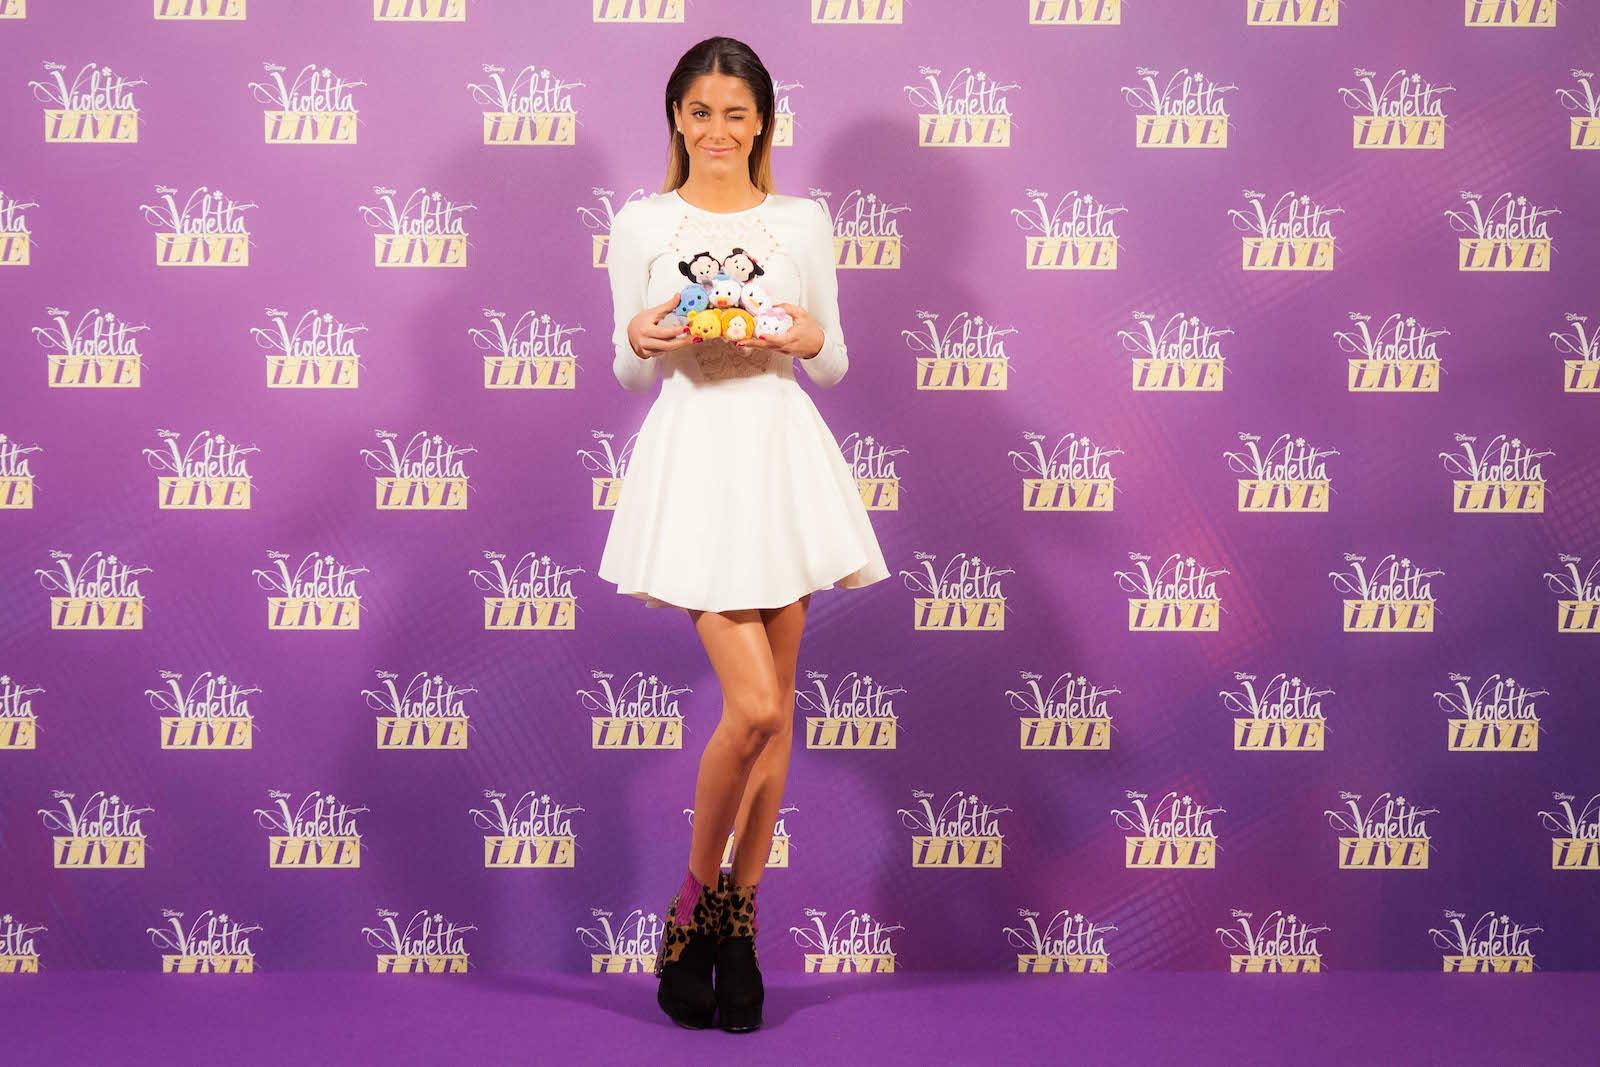 Violetta: Martina Stoessel al photocall milanese